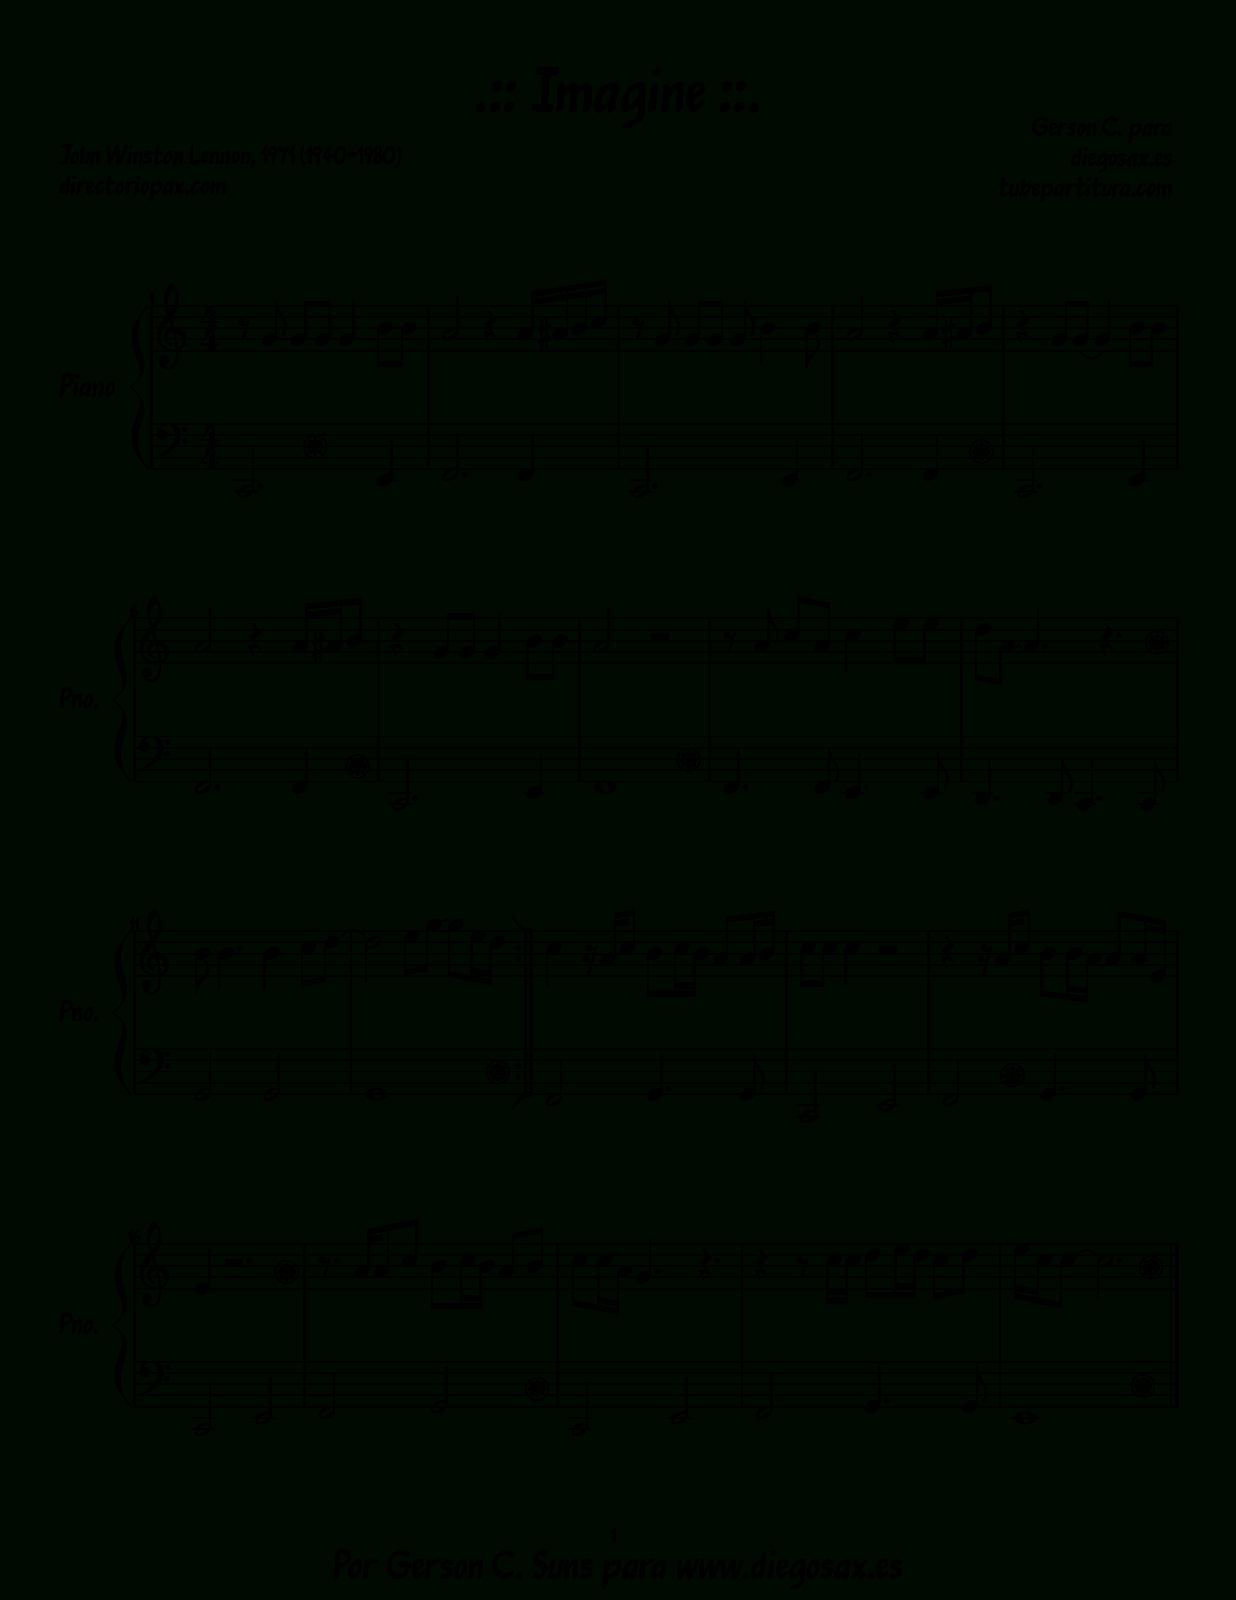 Pishaclay - Pop Songs Piano Sheet Music Pdf - Free Printable Sheet Music For Piano Beginners Popular Songs